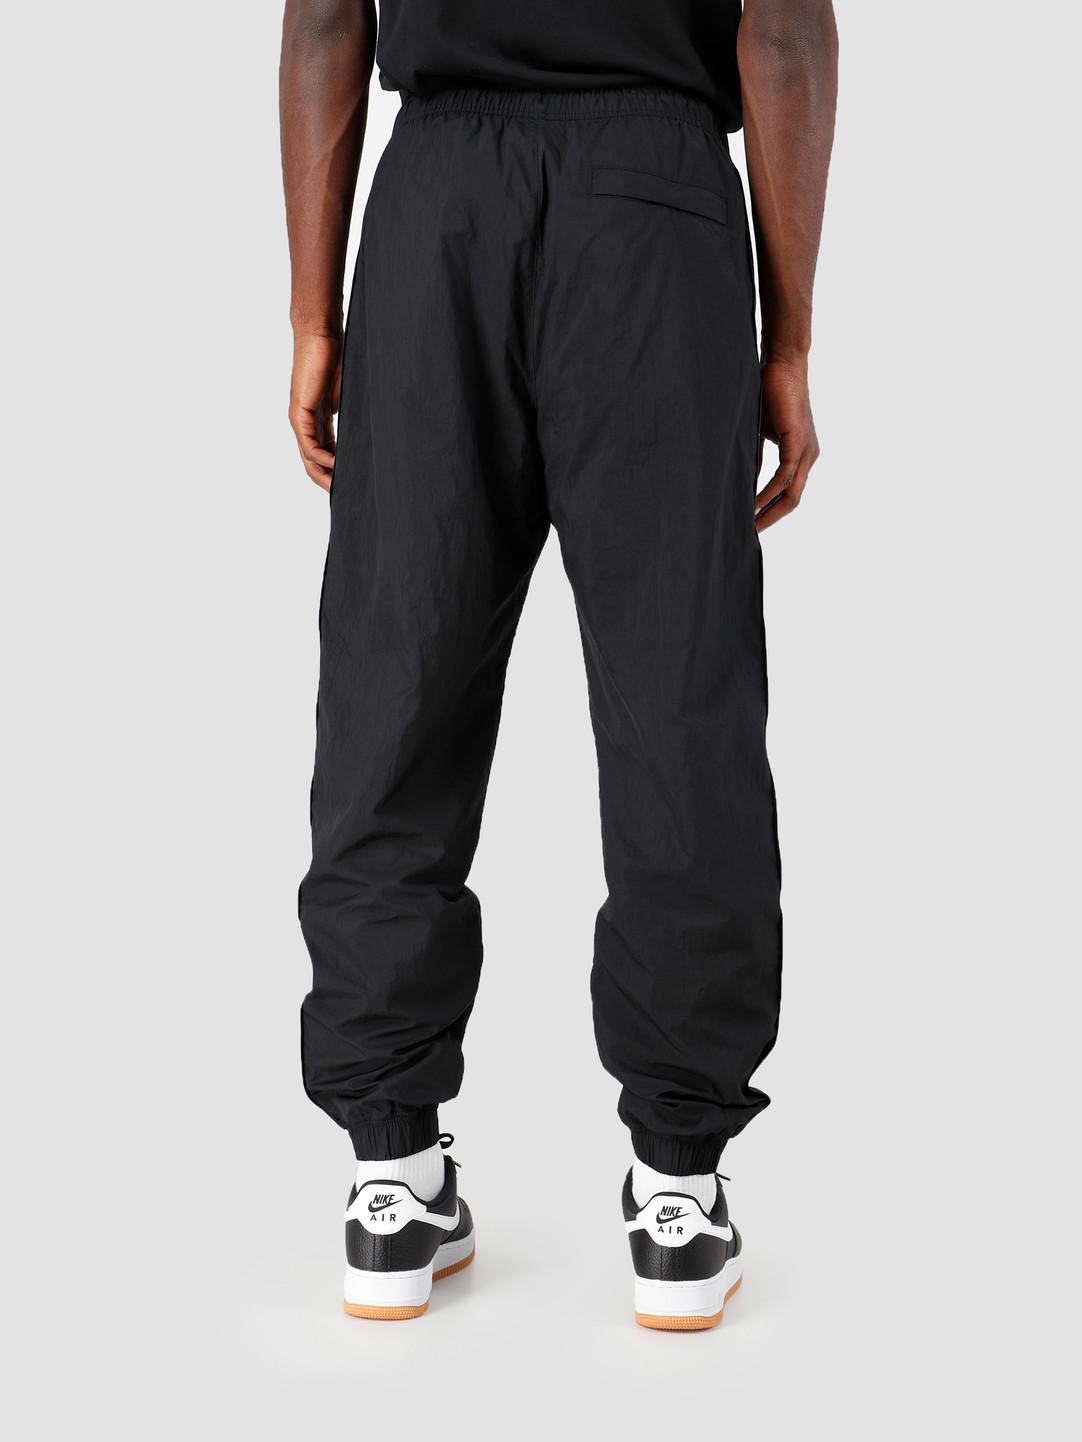 Nike Nike NSW Swoosh Pant Wvn Black White CD0421-010